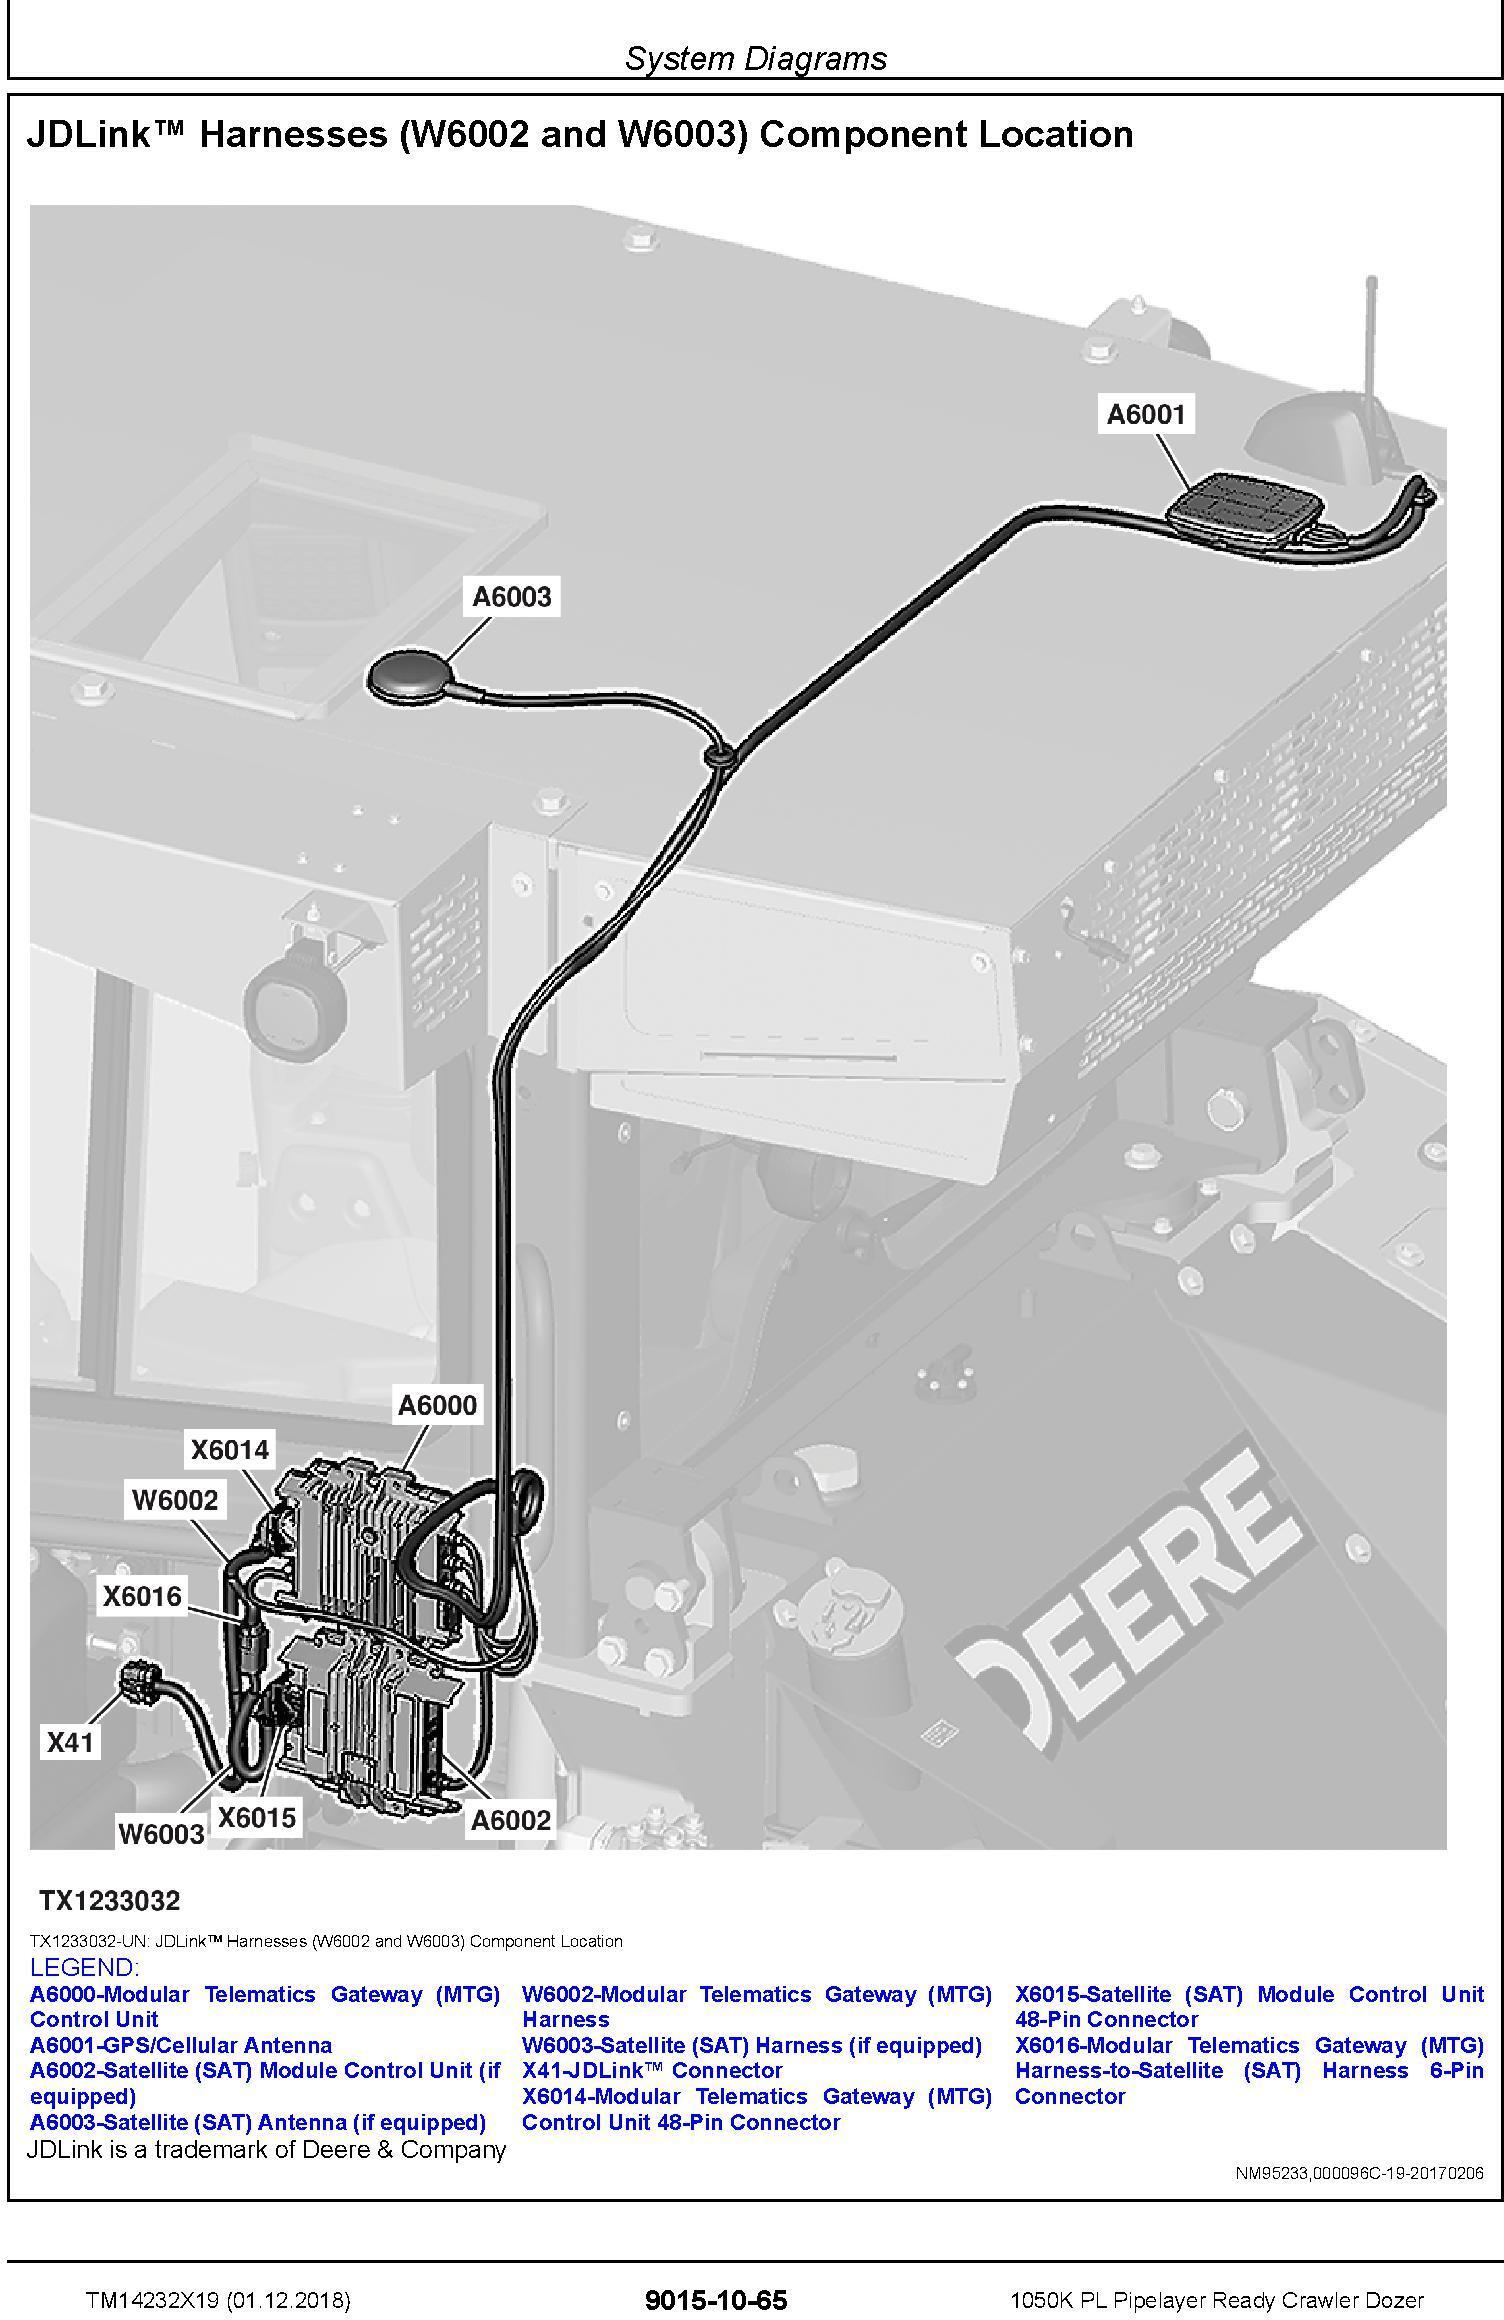 John Deere 1050K PL (SN.F310922-318801) Pipelayer Ready Crawler Dozer Diagnostic Manual (TM14232X19) - 1